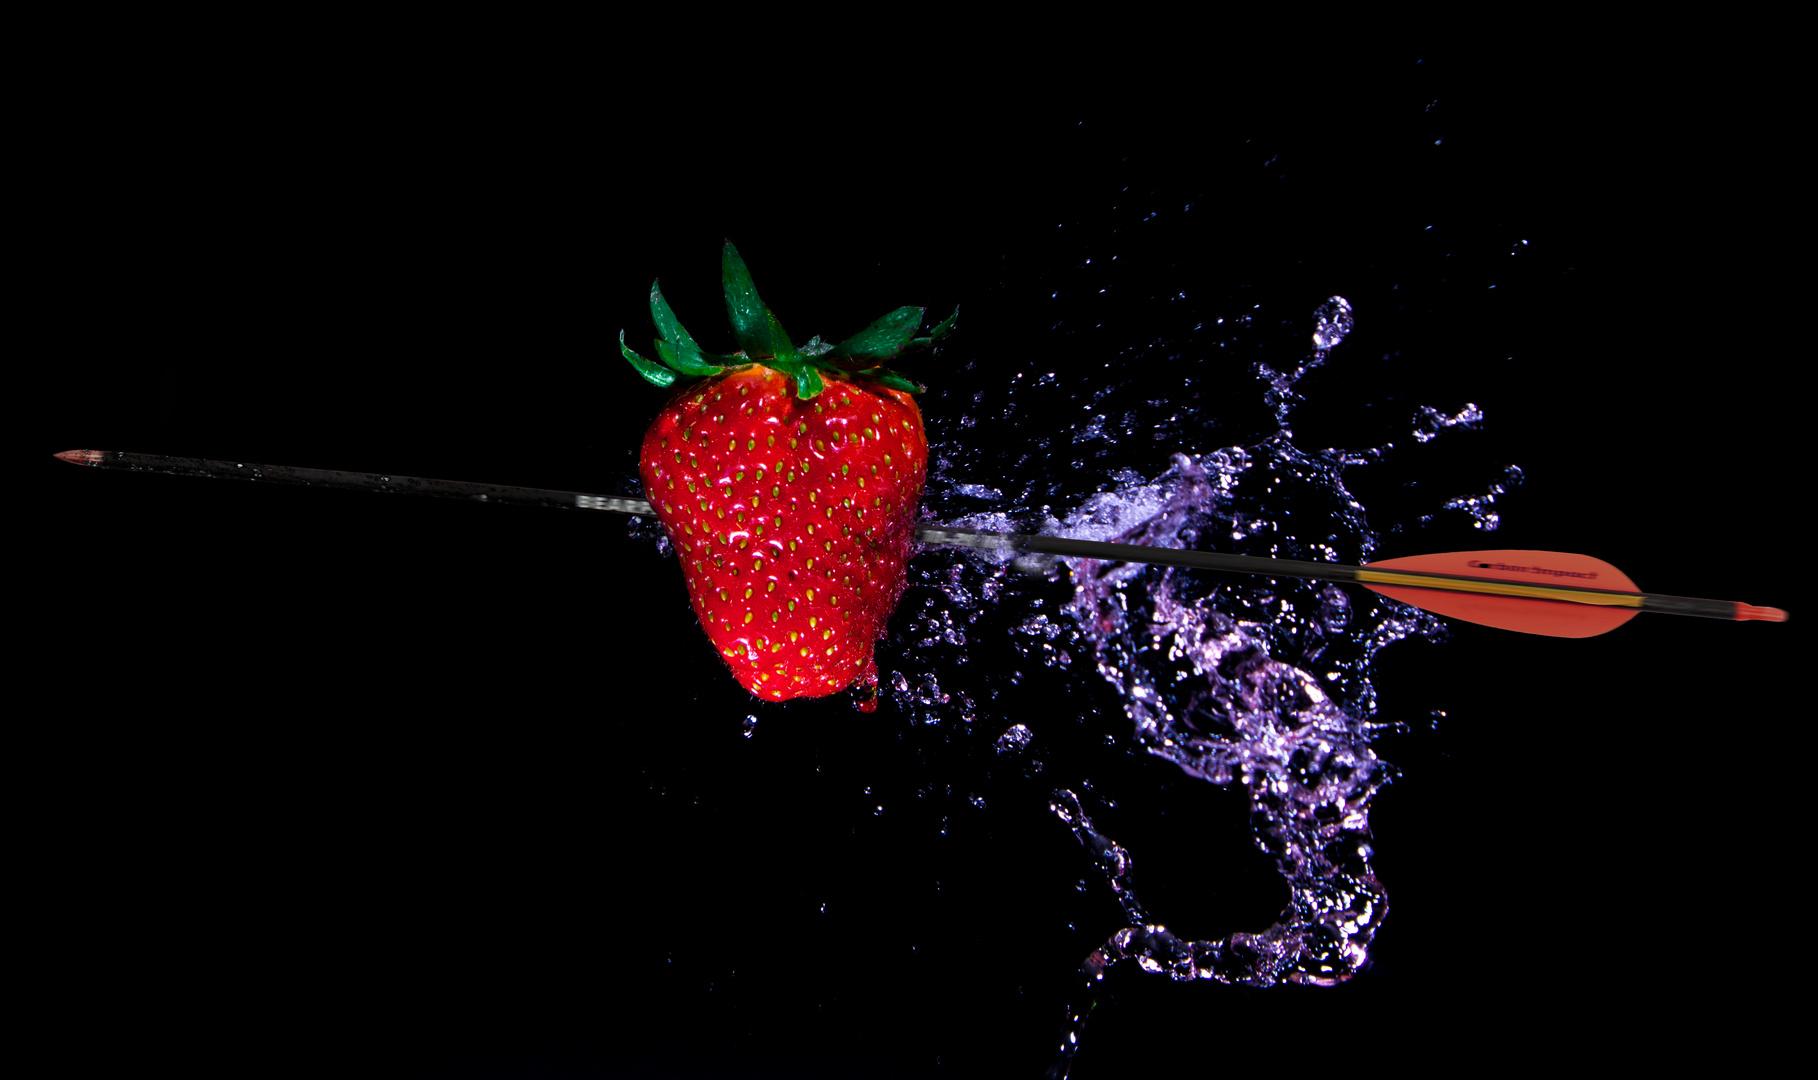 Der Erdbeerschuss